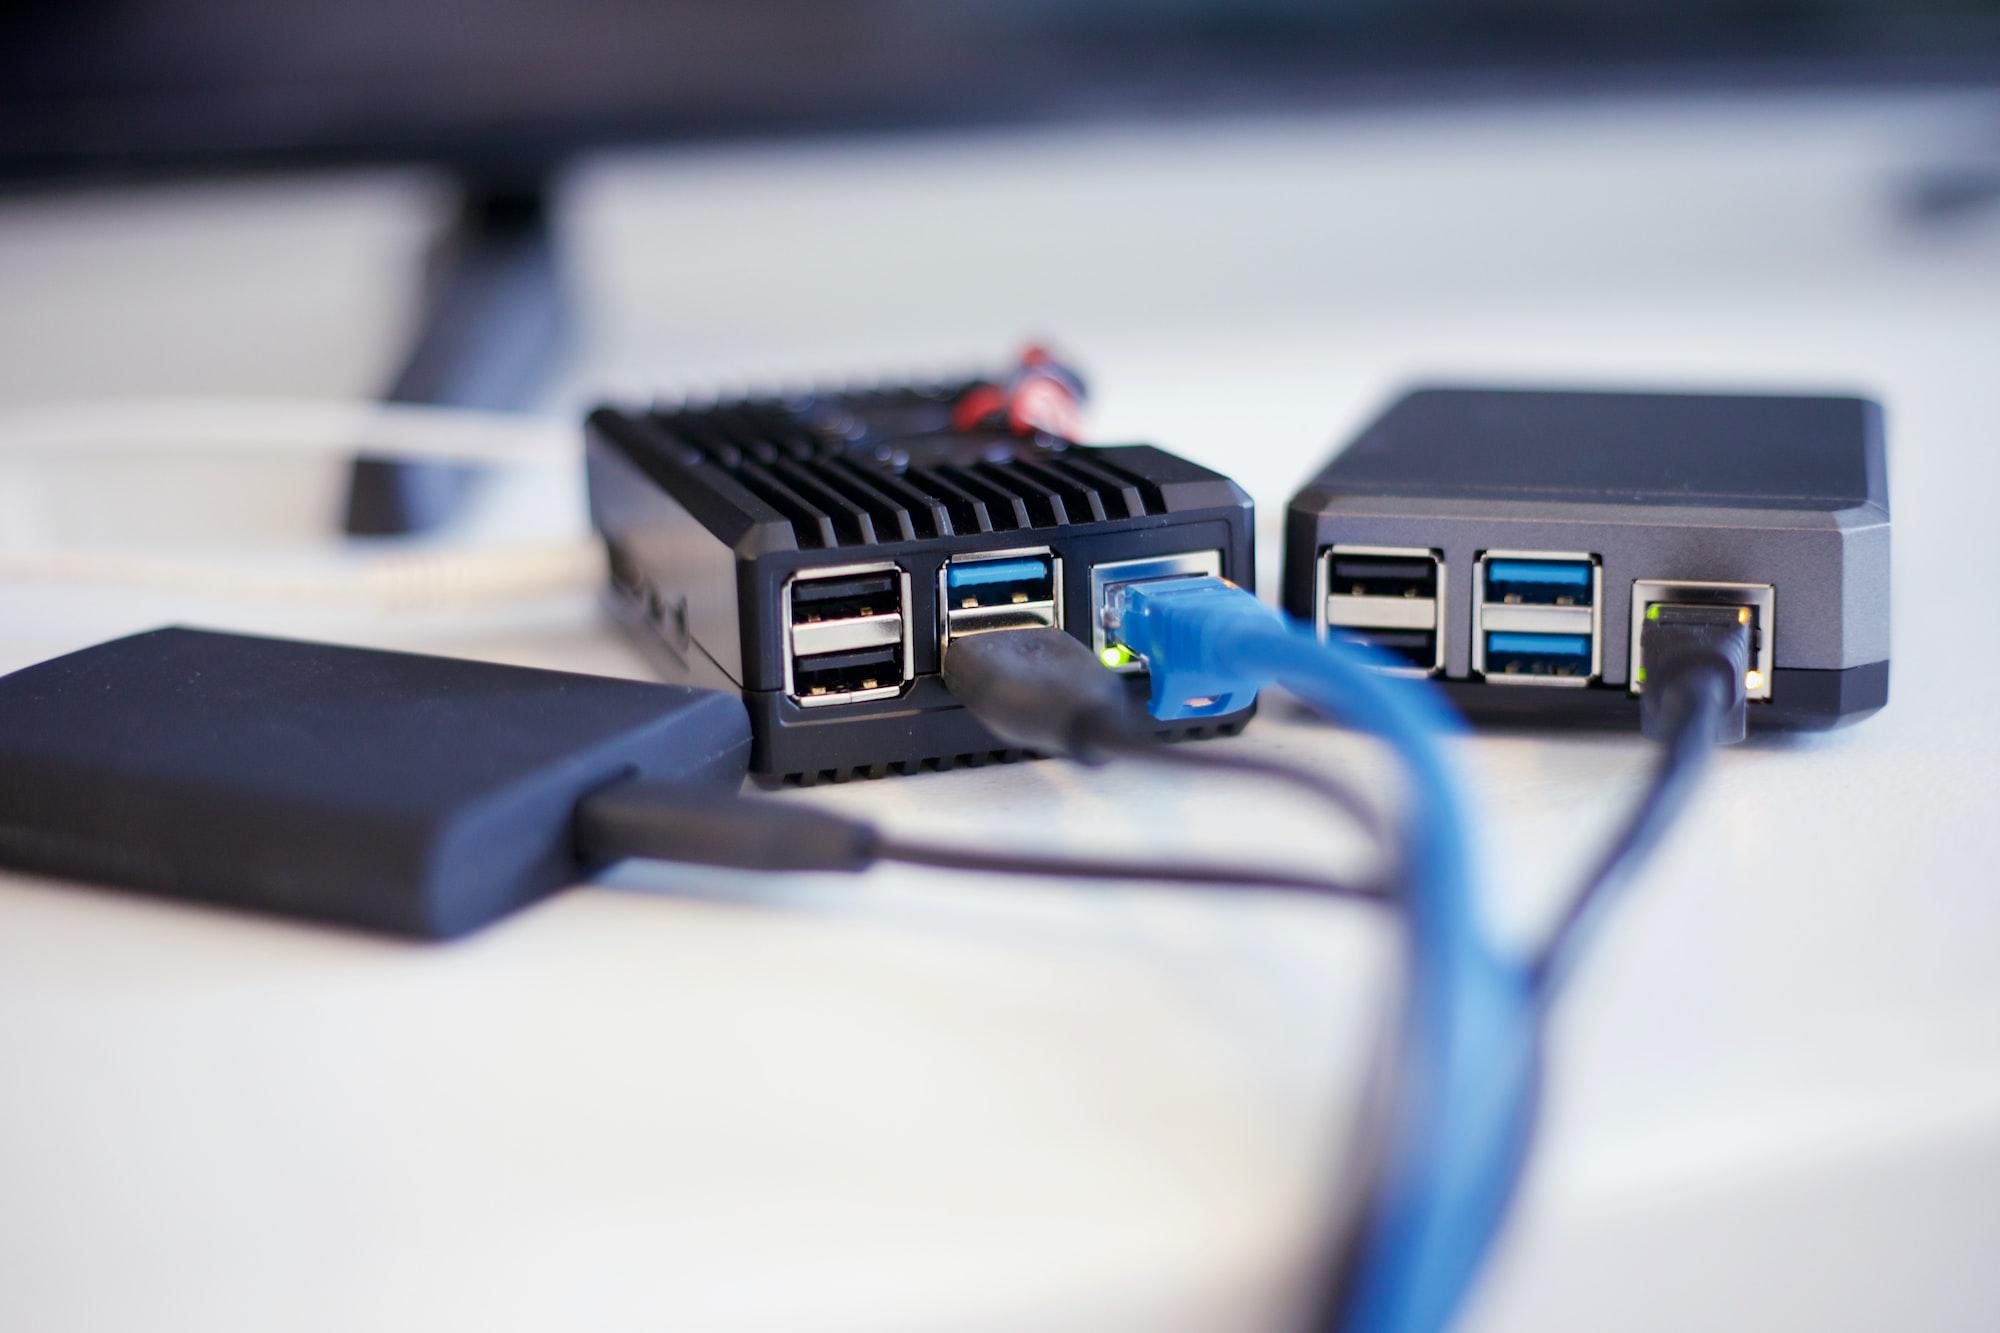 Turn a Raspberry Pi into a NAS (Network Attached Storage) Server